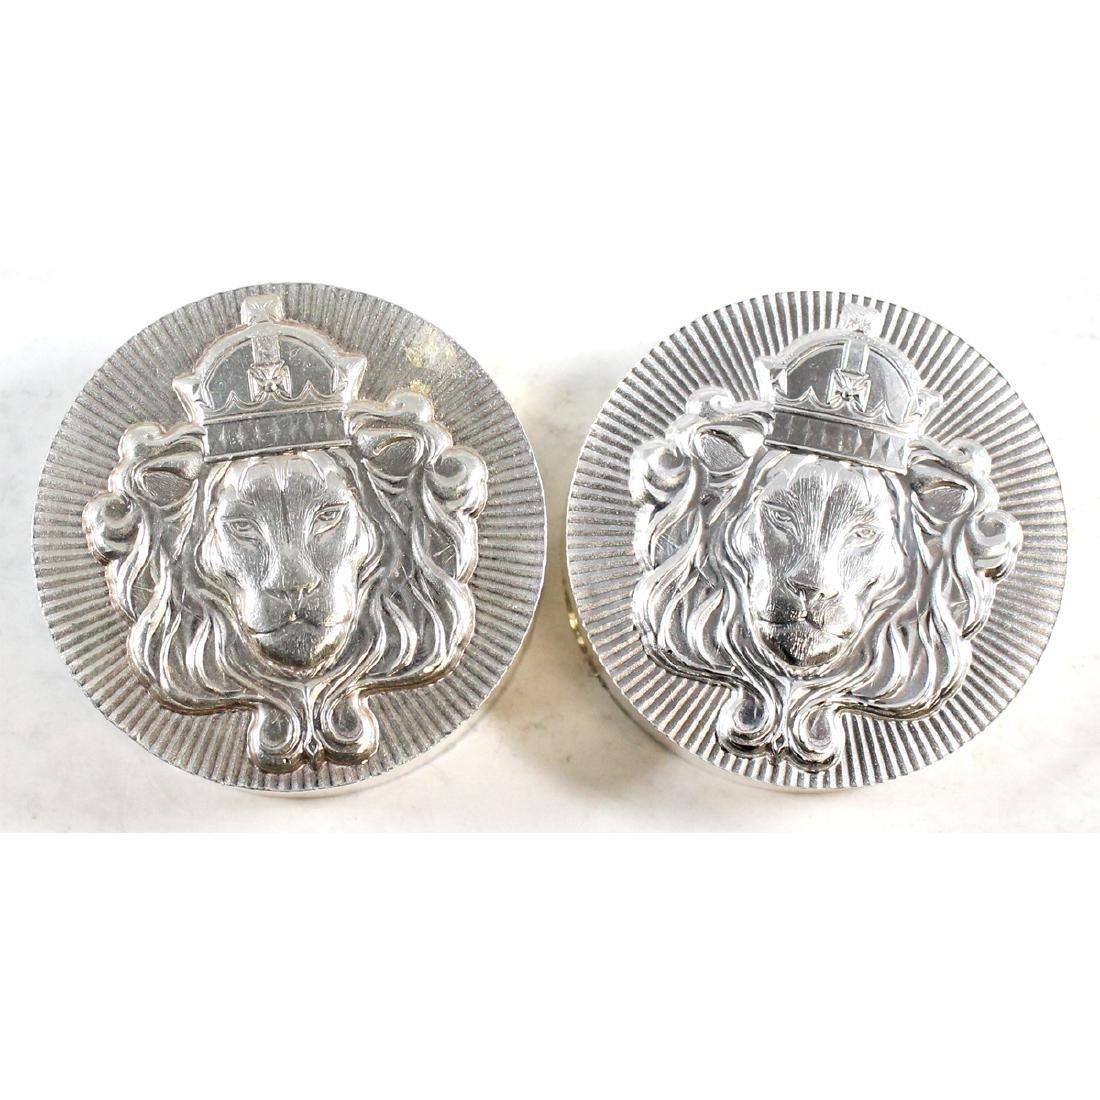 5oz & 100 Gram Scottsdale Mint .999 Fine Silver Stacker